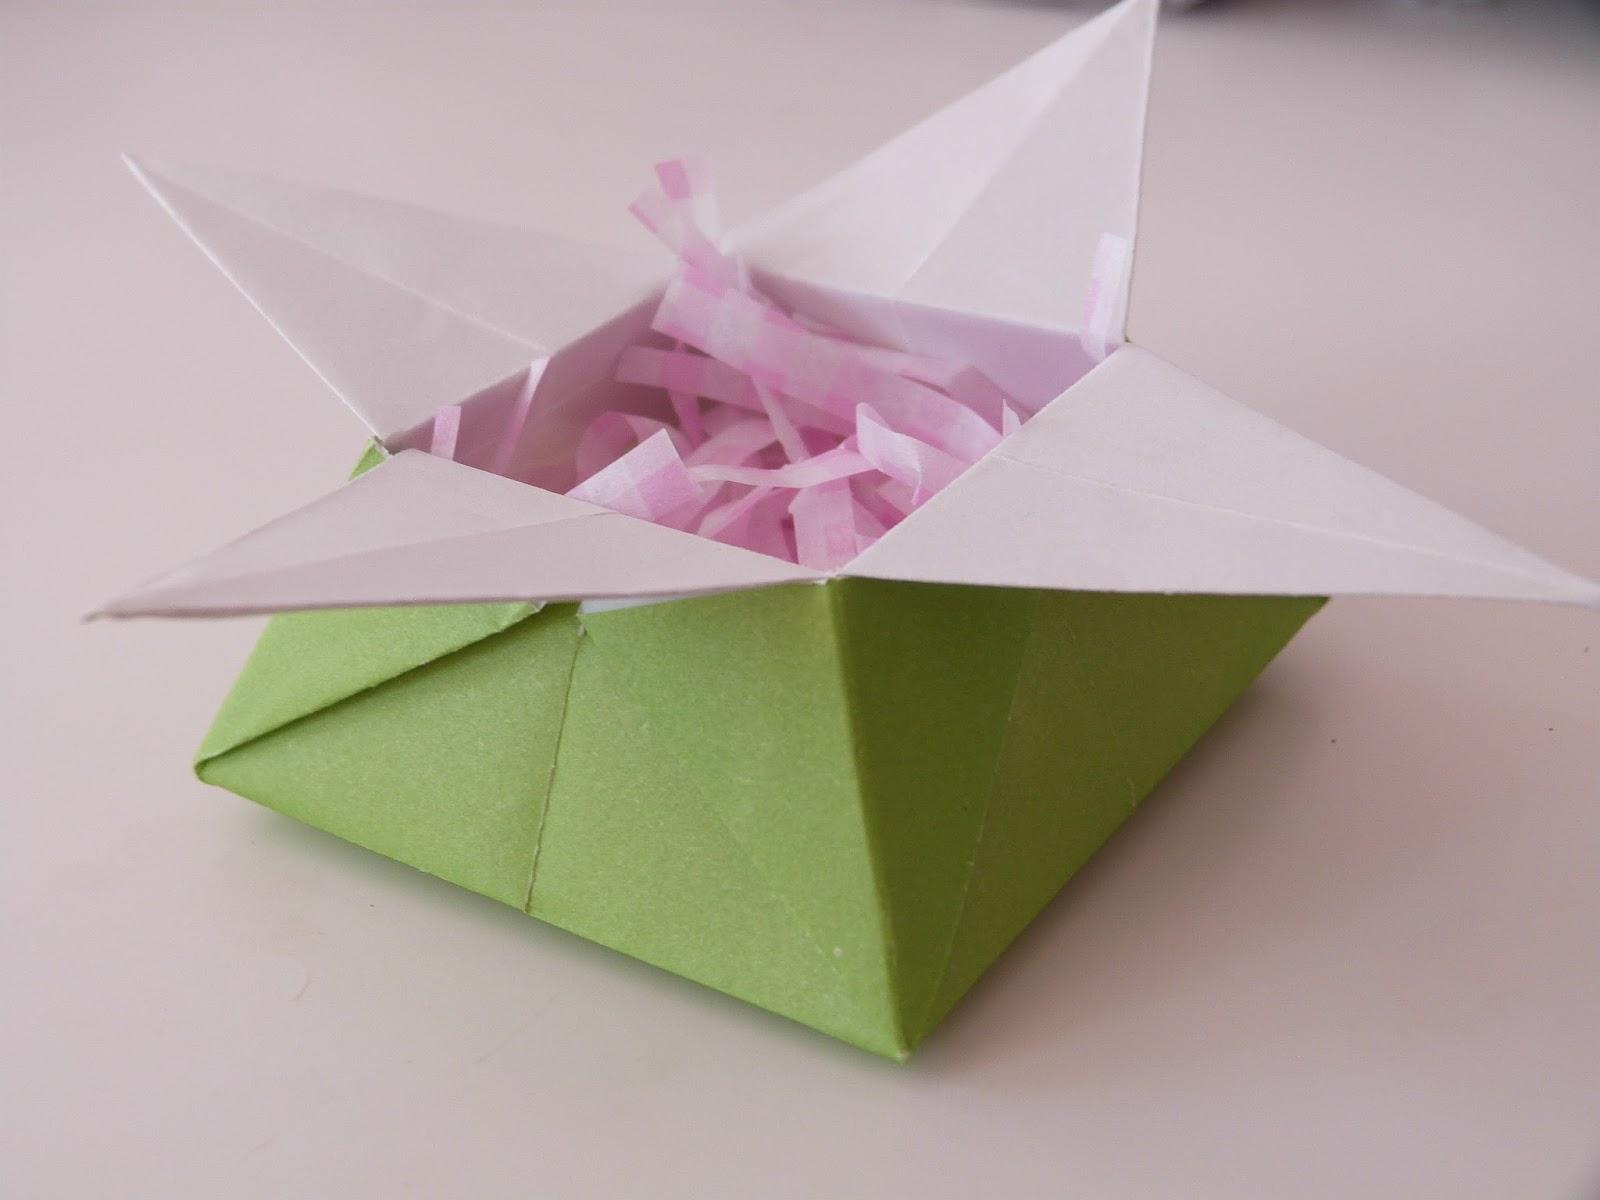 Folding an Origami Gift Box Like a Pro: Easy Tutorial | ThatSweetGift | 1200x1600